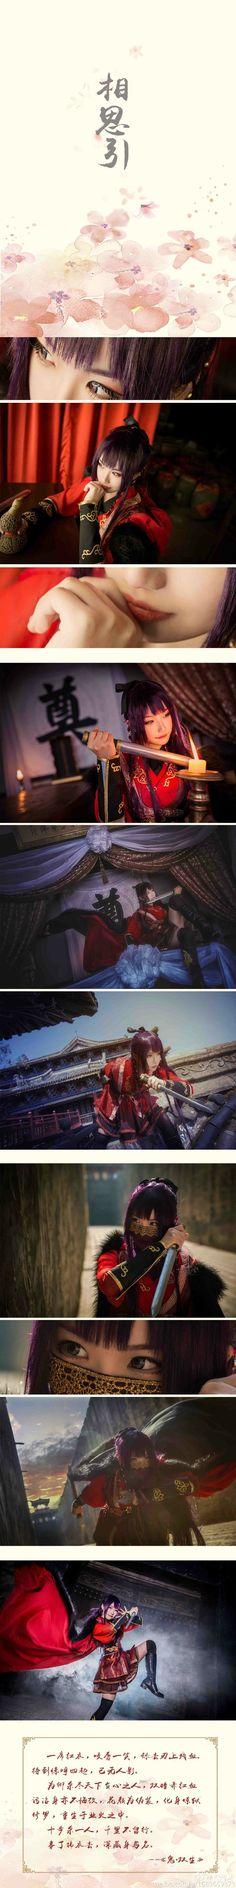 神魔井-秭颜 's Weibo_Weibo